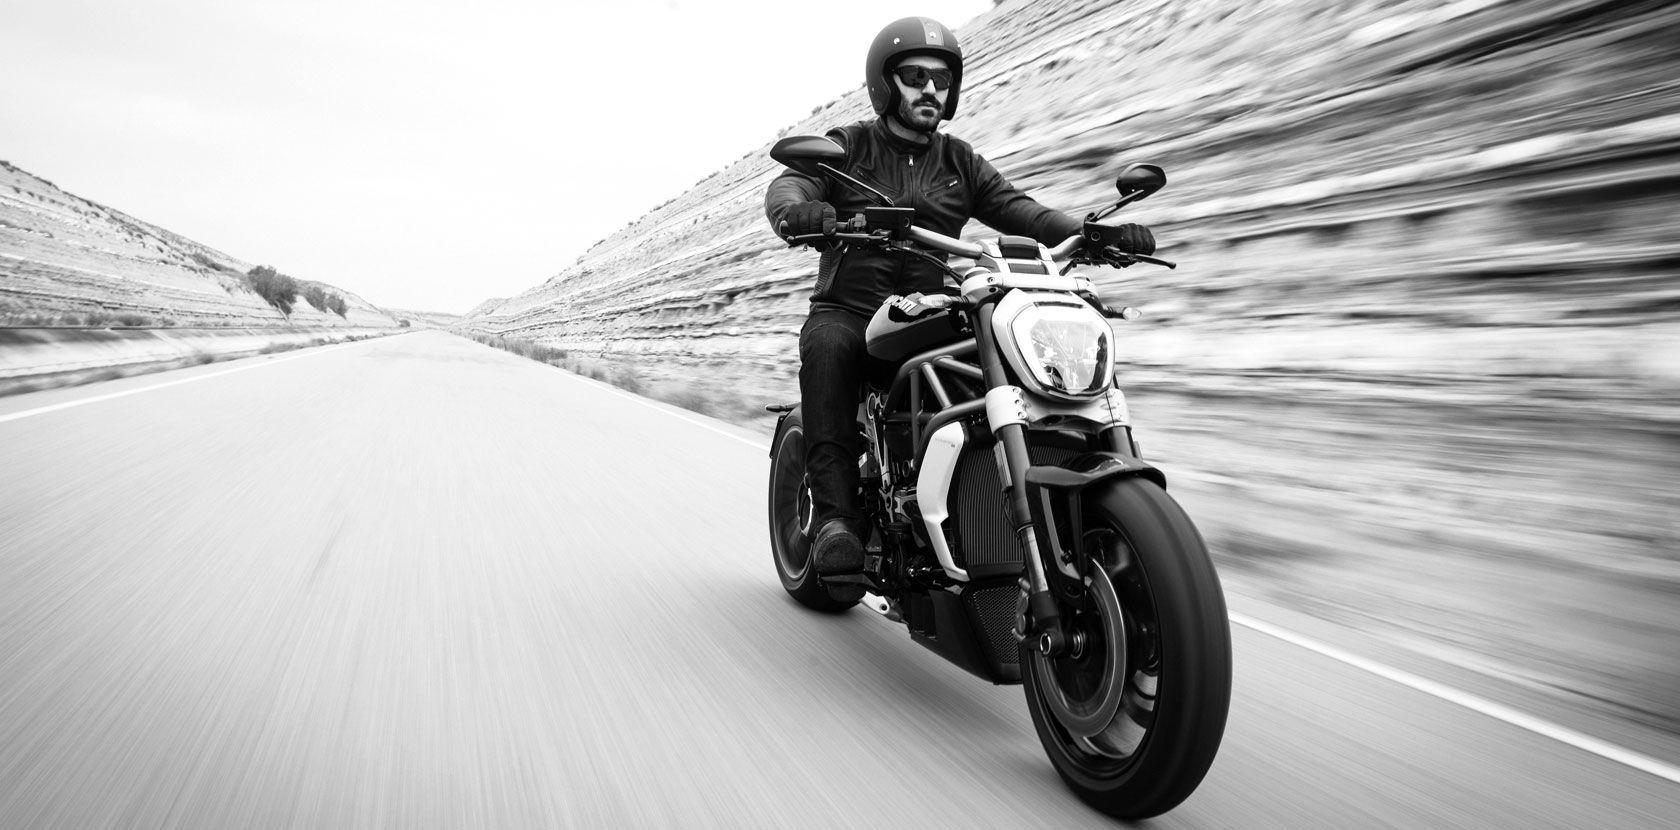 2016 Ducati XDiavel S | XDiavel - Rolling Shot